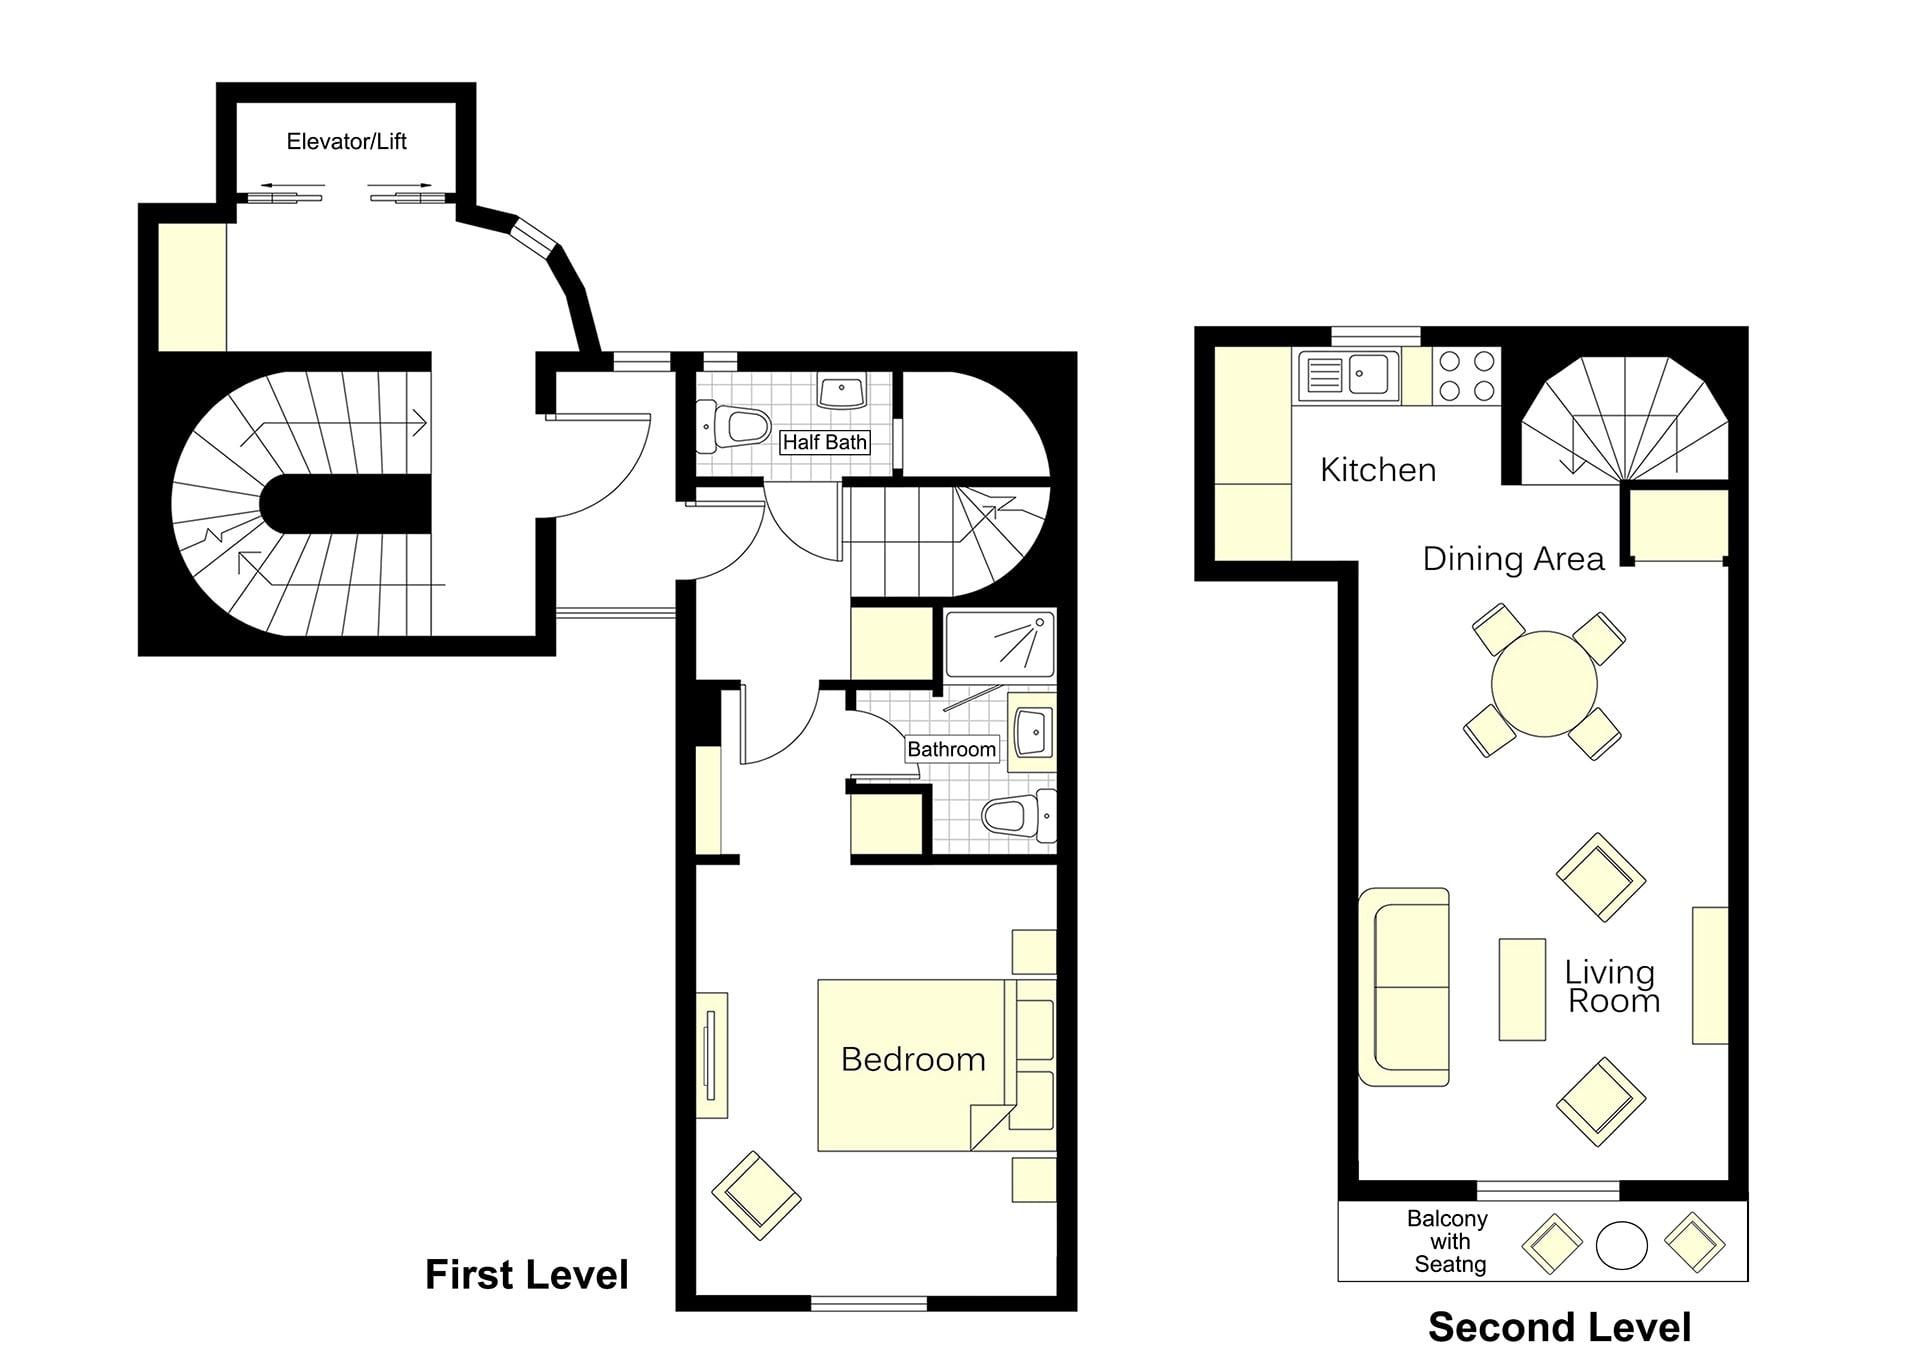 Monbazillac Floorplan